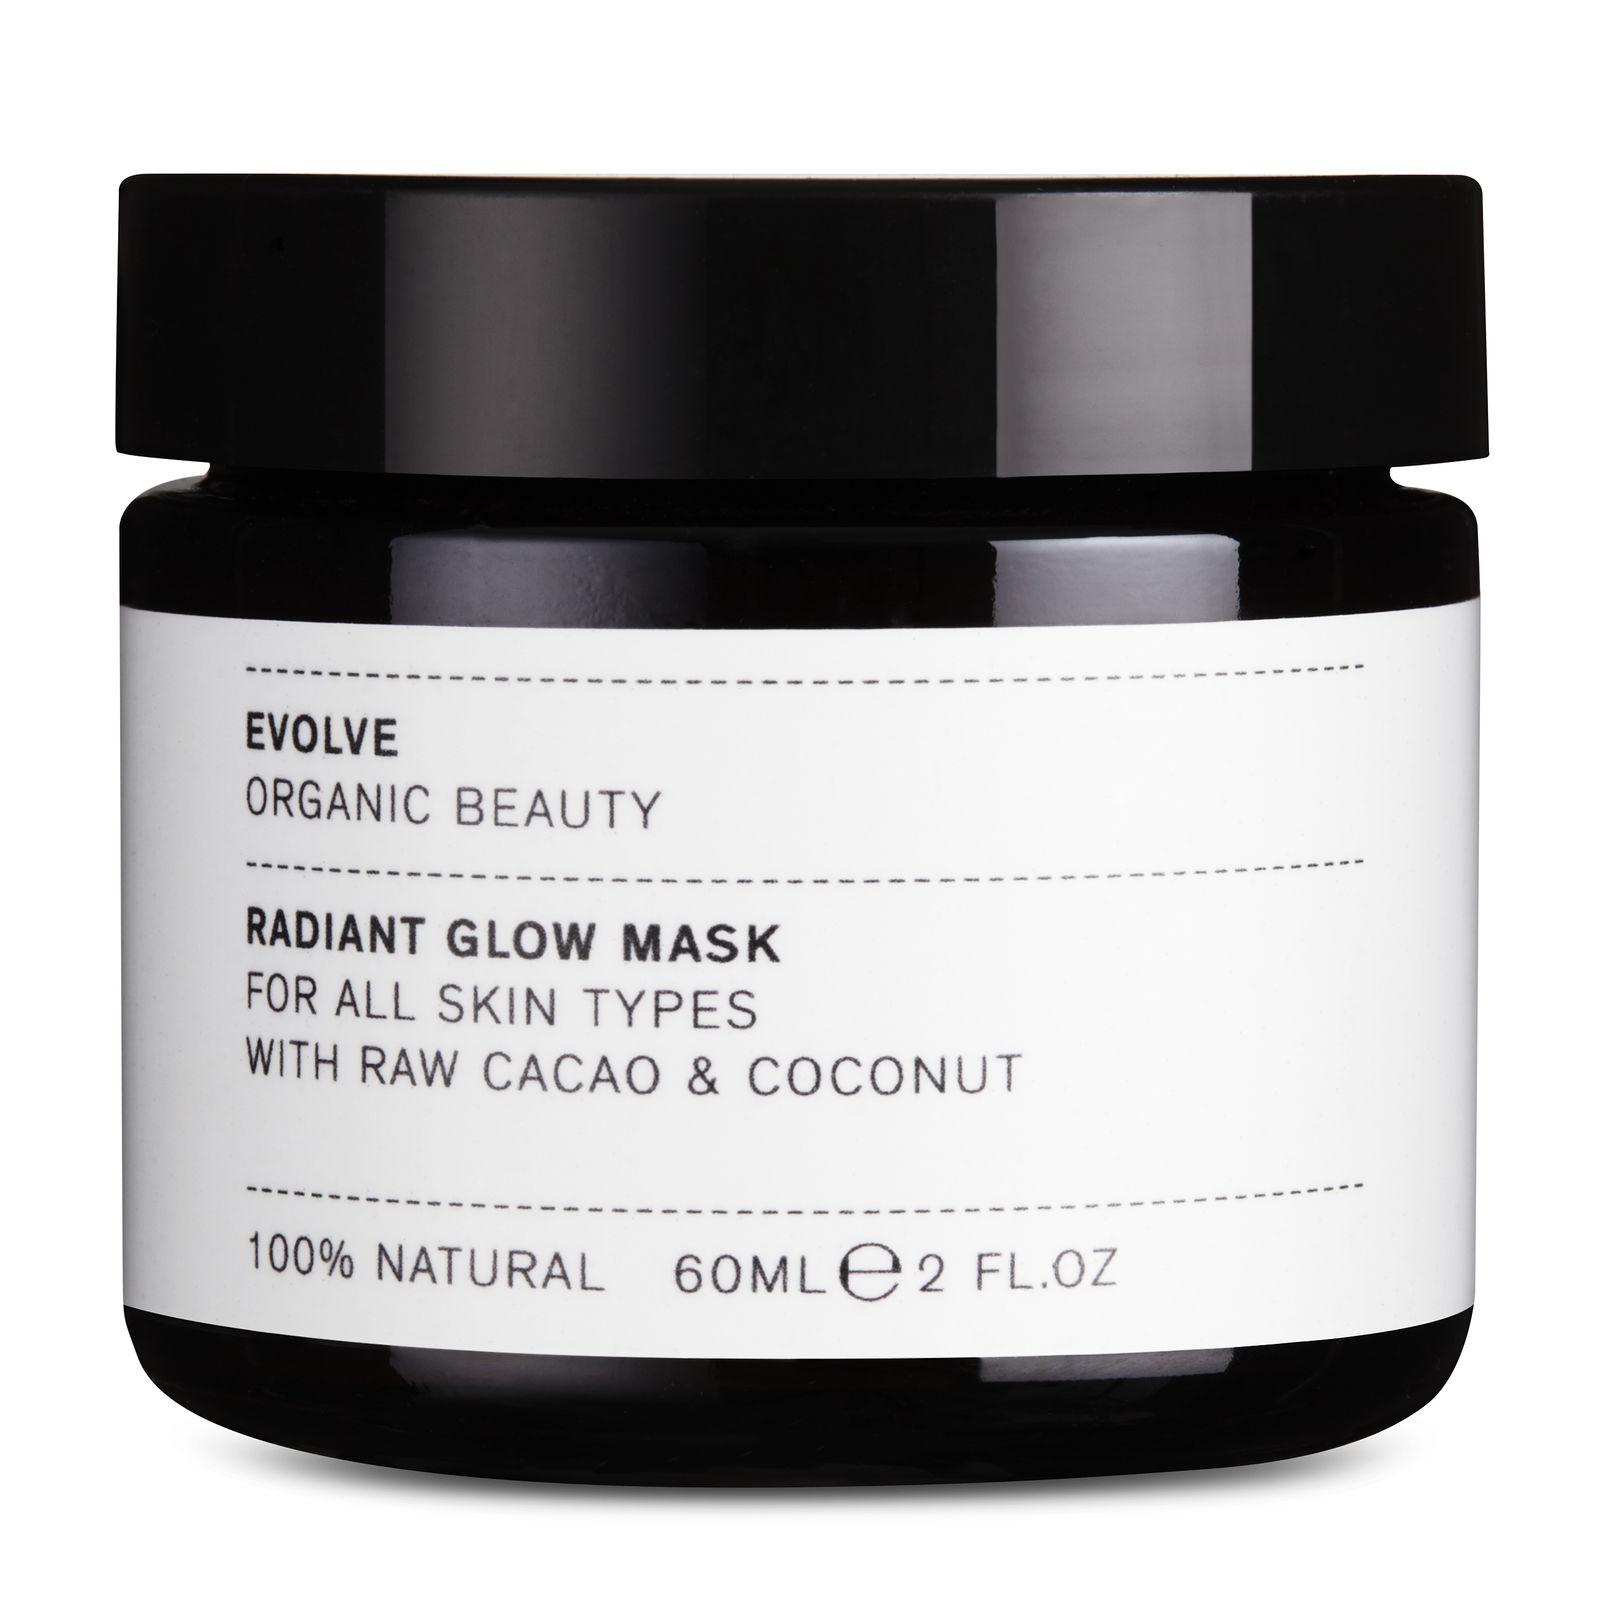 Evolve - Radiant Glow Mask 60 ml